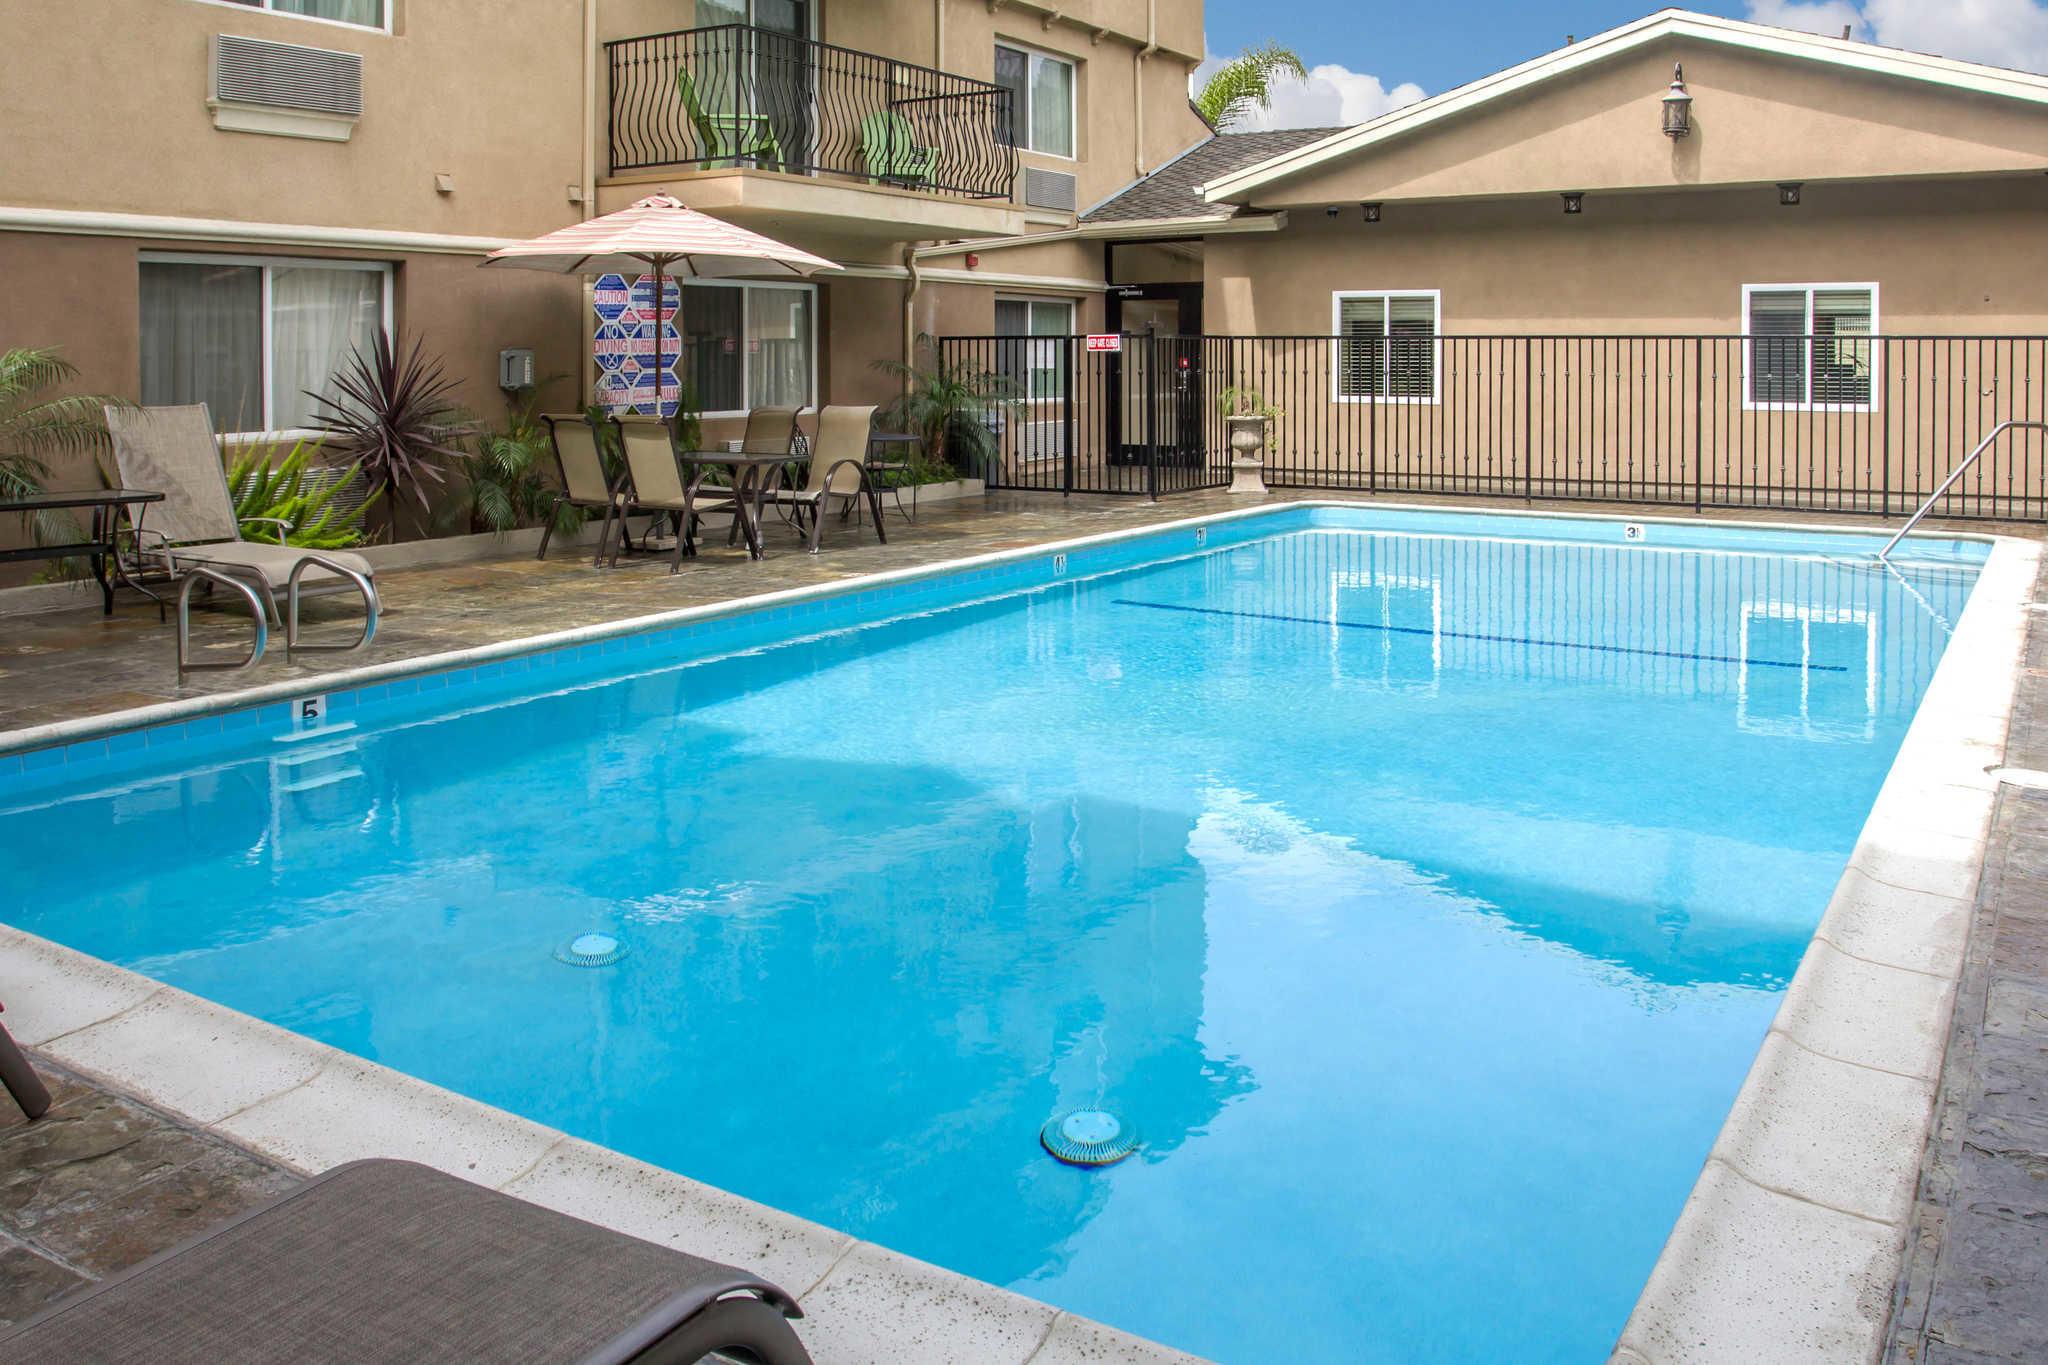 Los Angeles (LAX) Airport Hotel - Holiday Inn Express Los